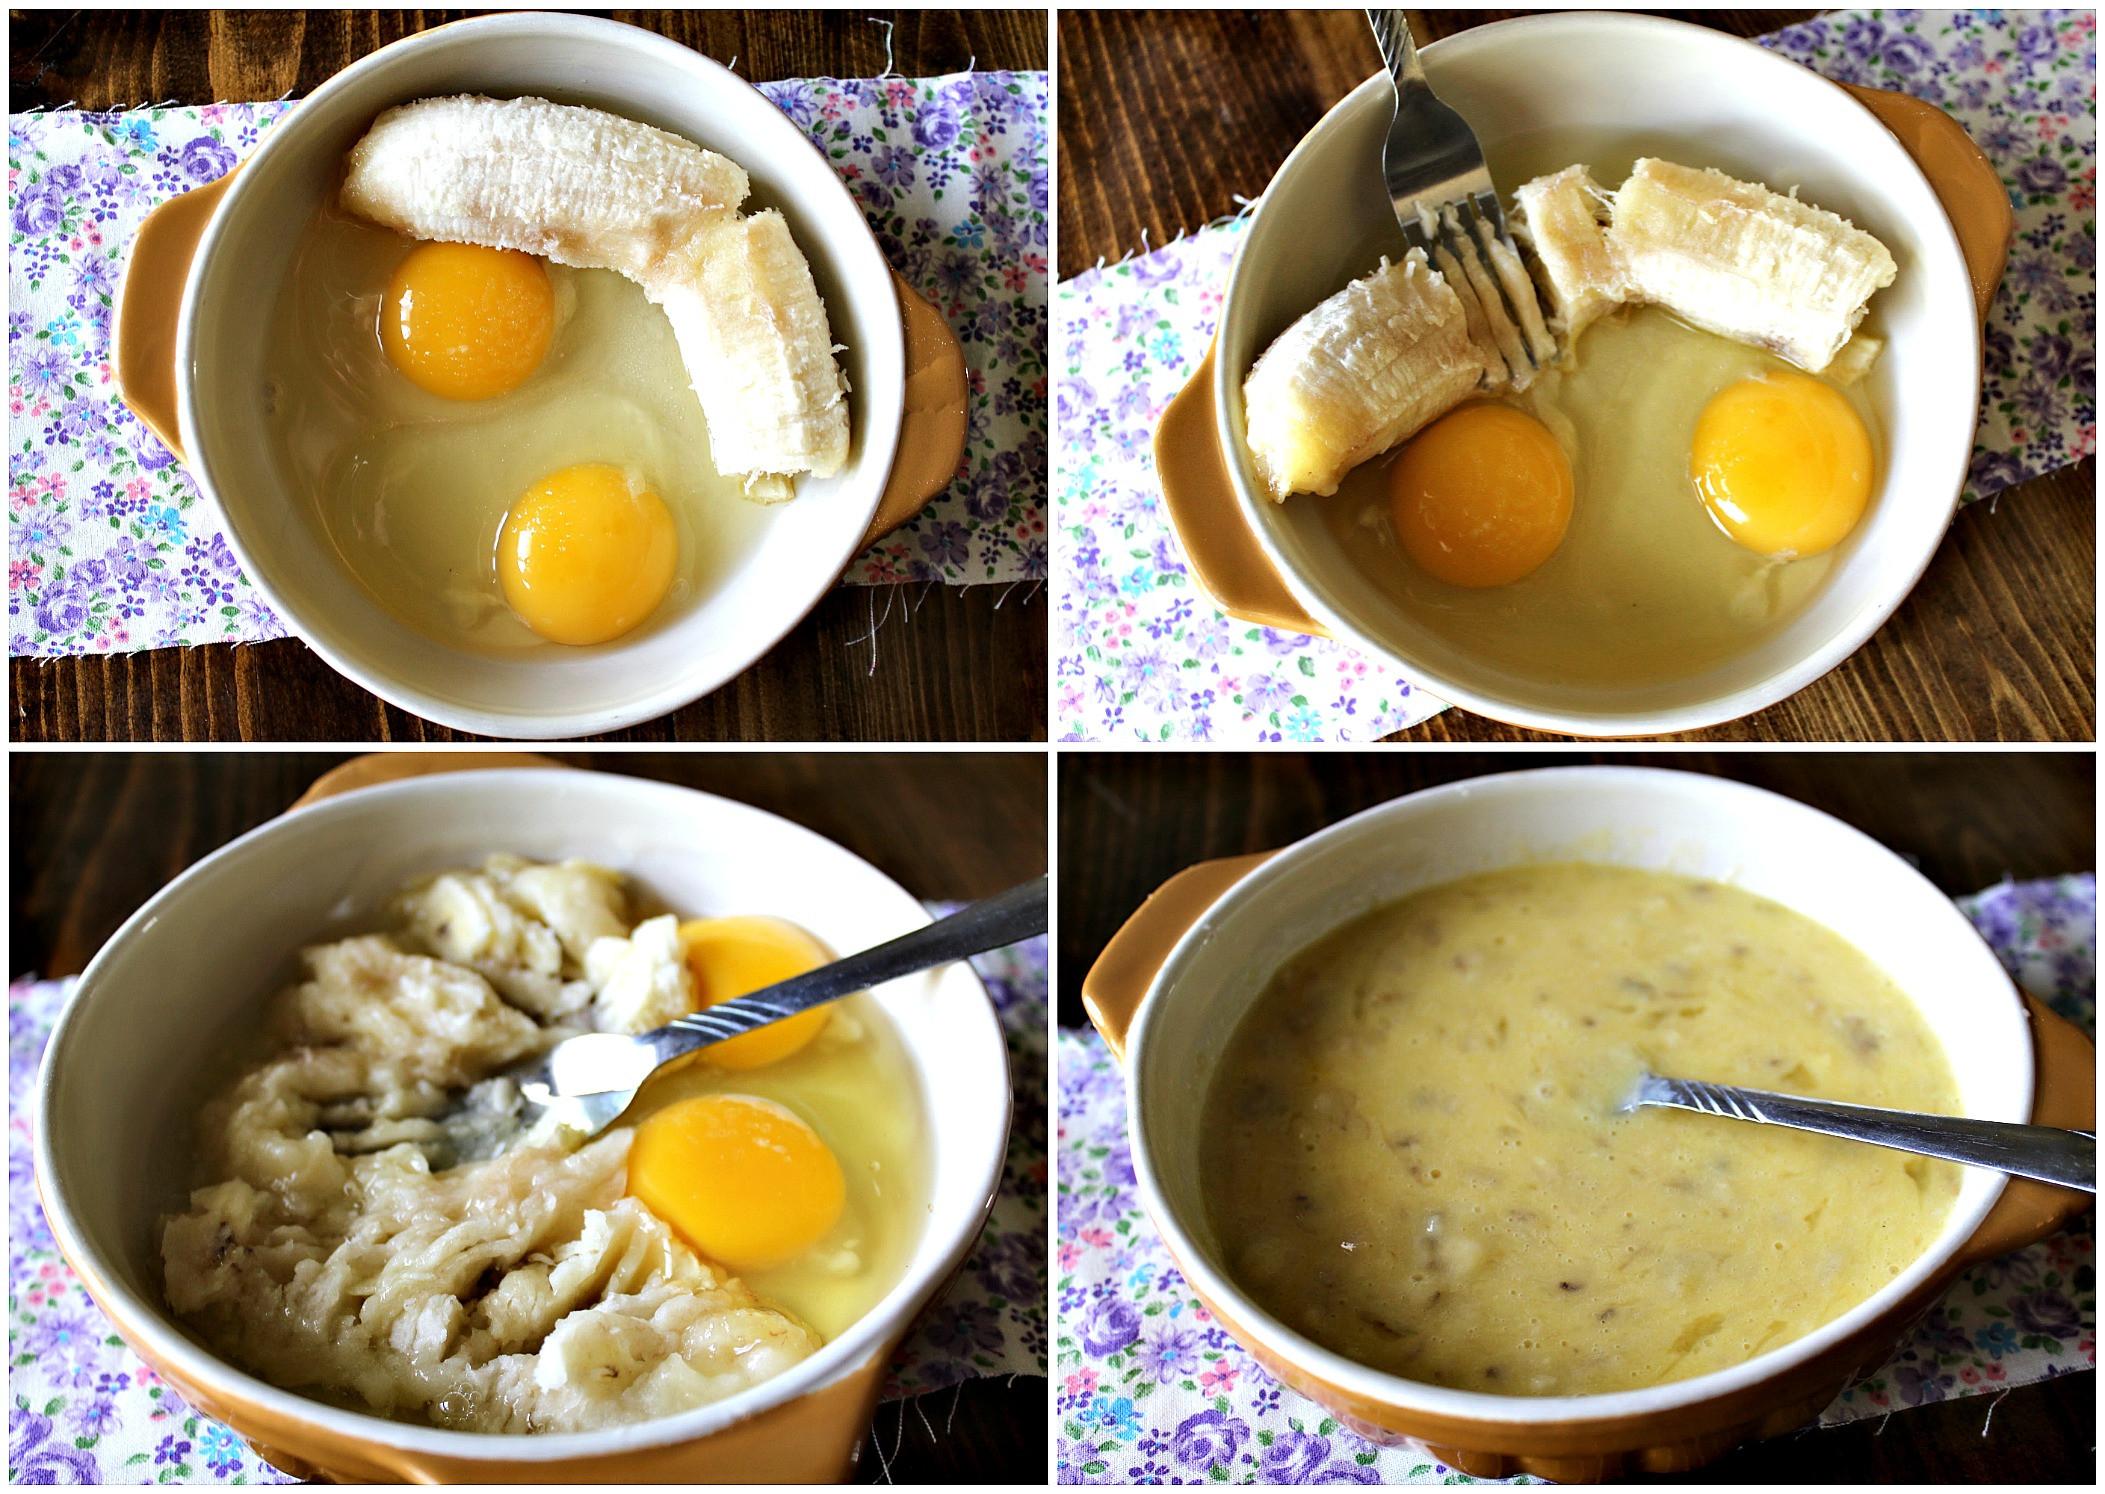 Banana And Egg Pancakes  Blueberry Banana Egg Pancakes – Simply Taralynn